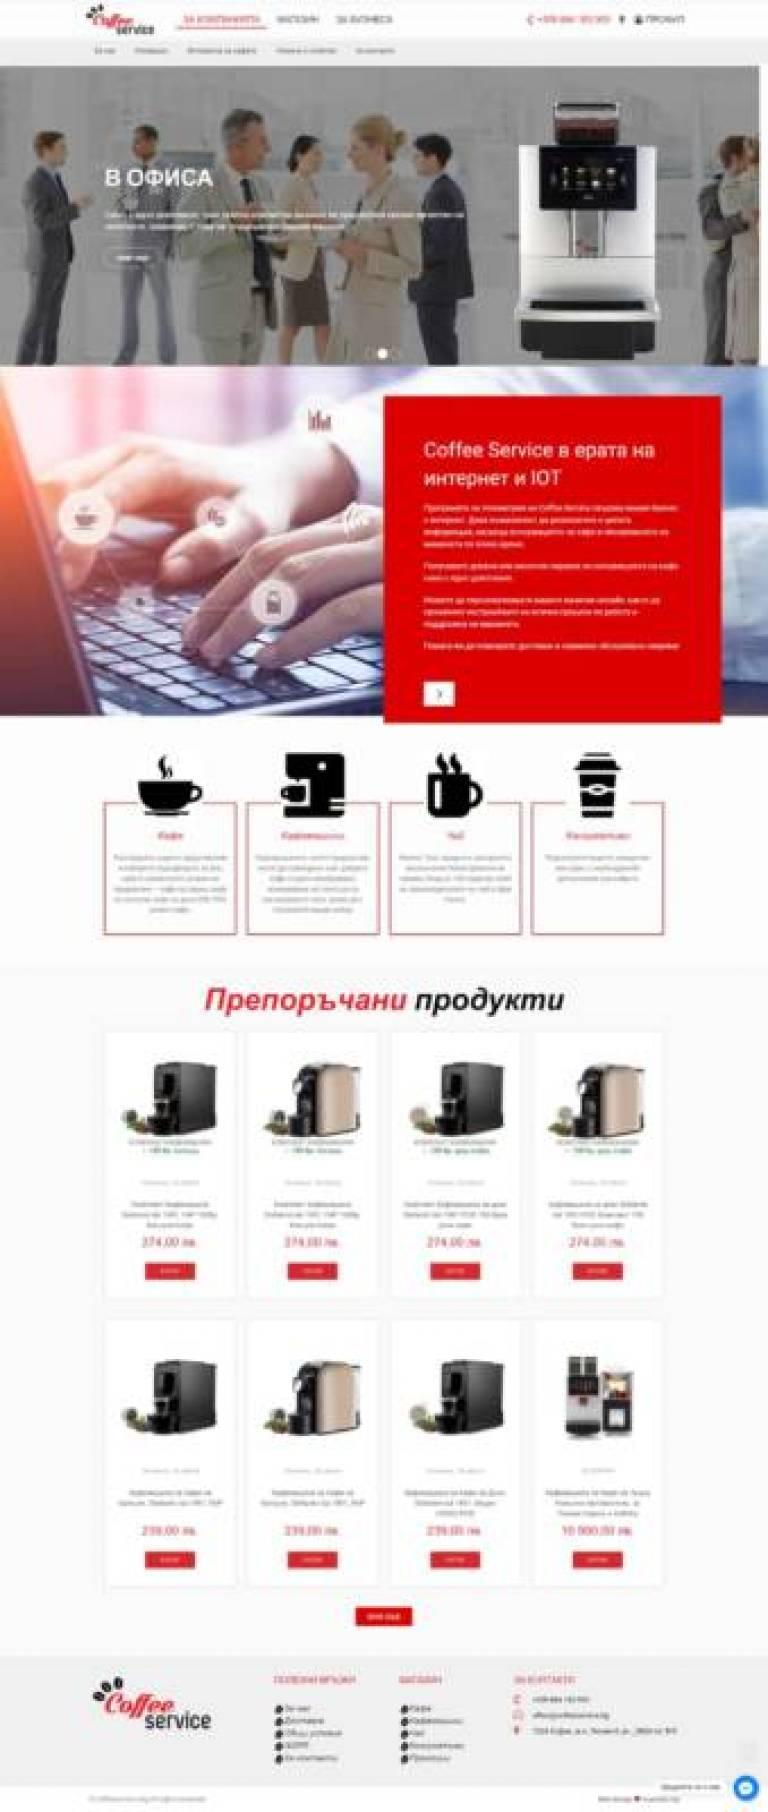 screencapture-coffeeservice-bg-2019-06-14-17_47_19